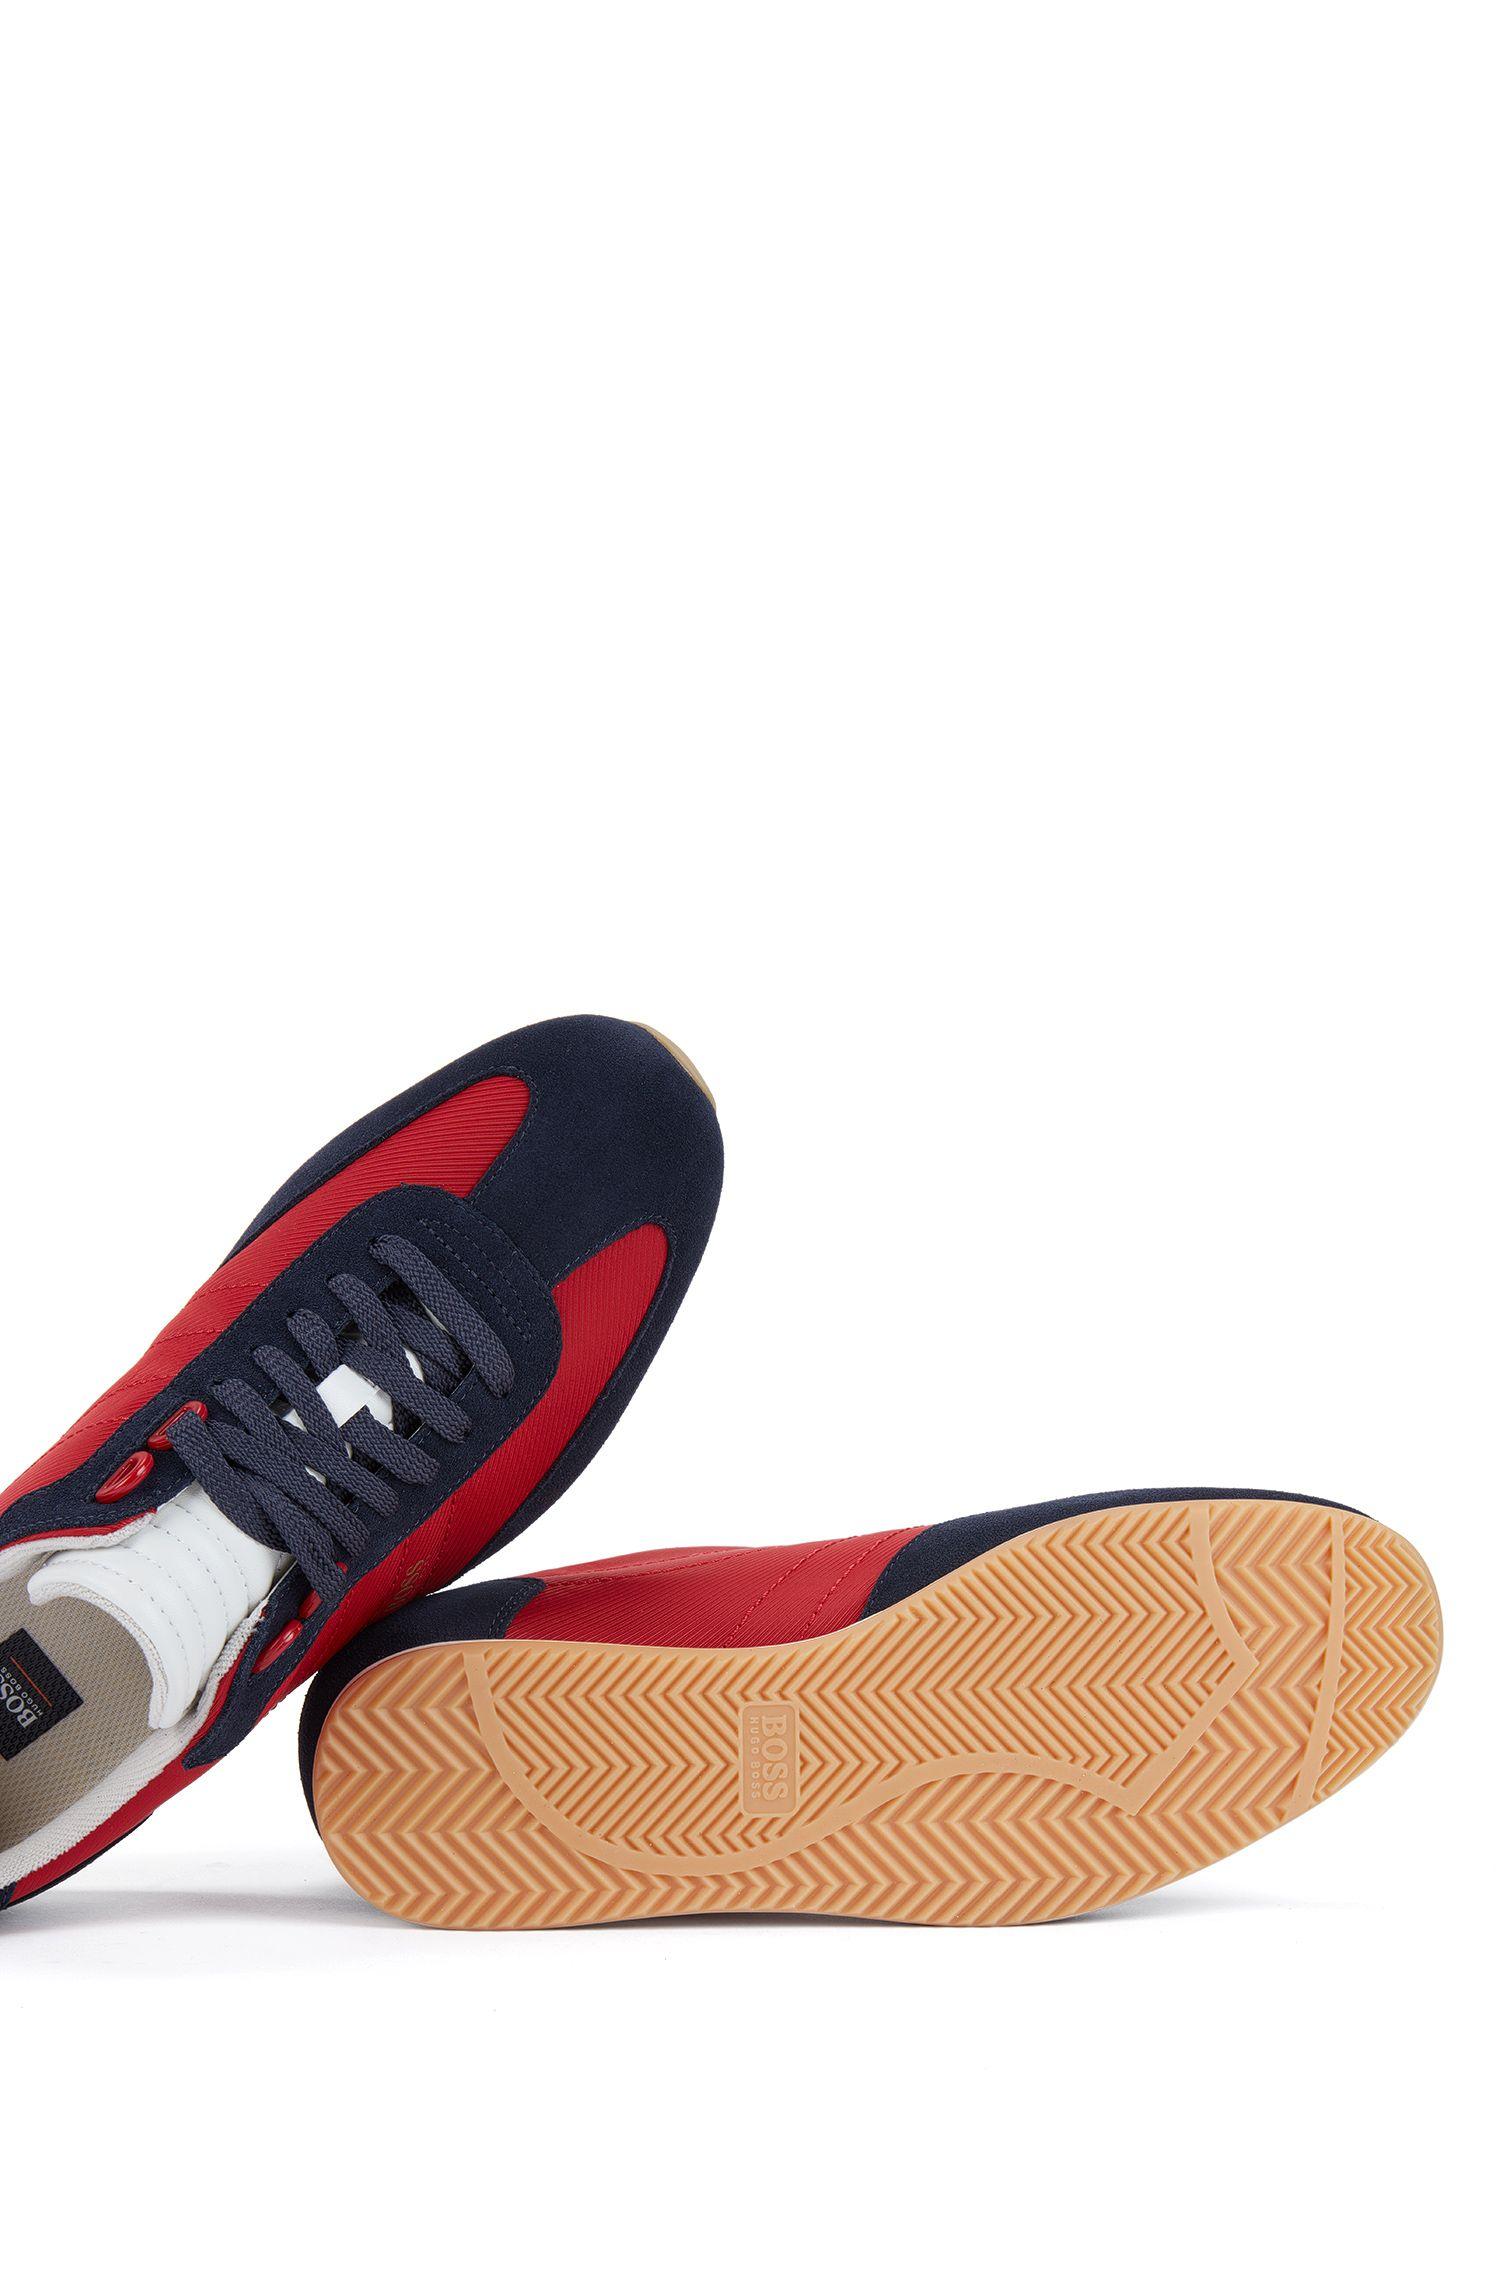 Sneakers aus Nylon mit Veloursleder-Details